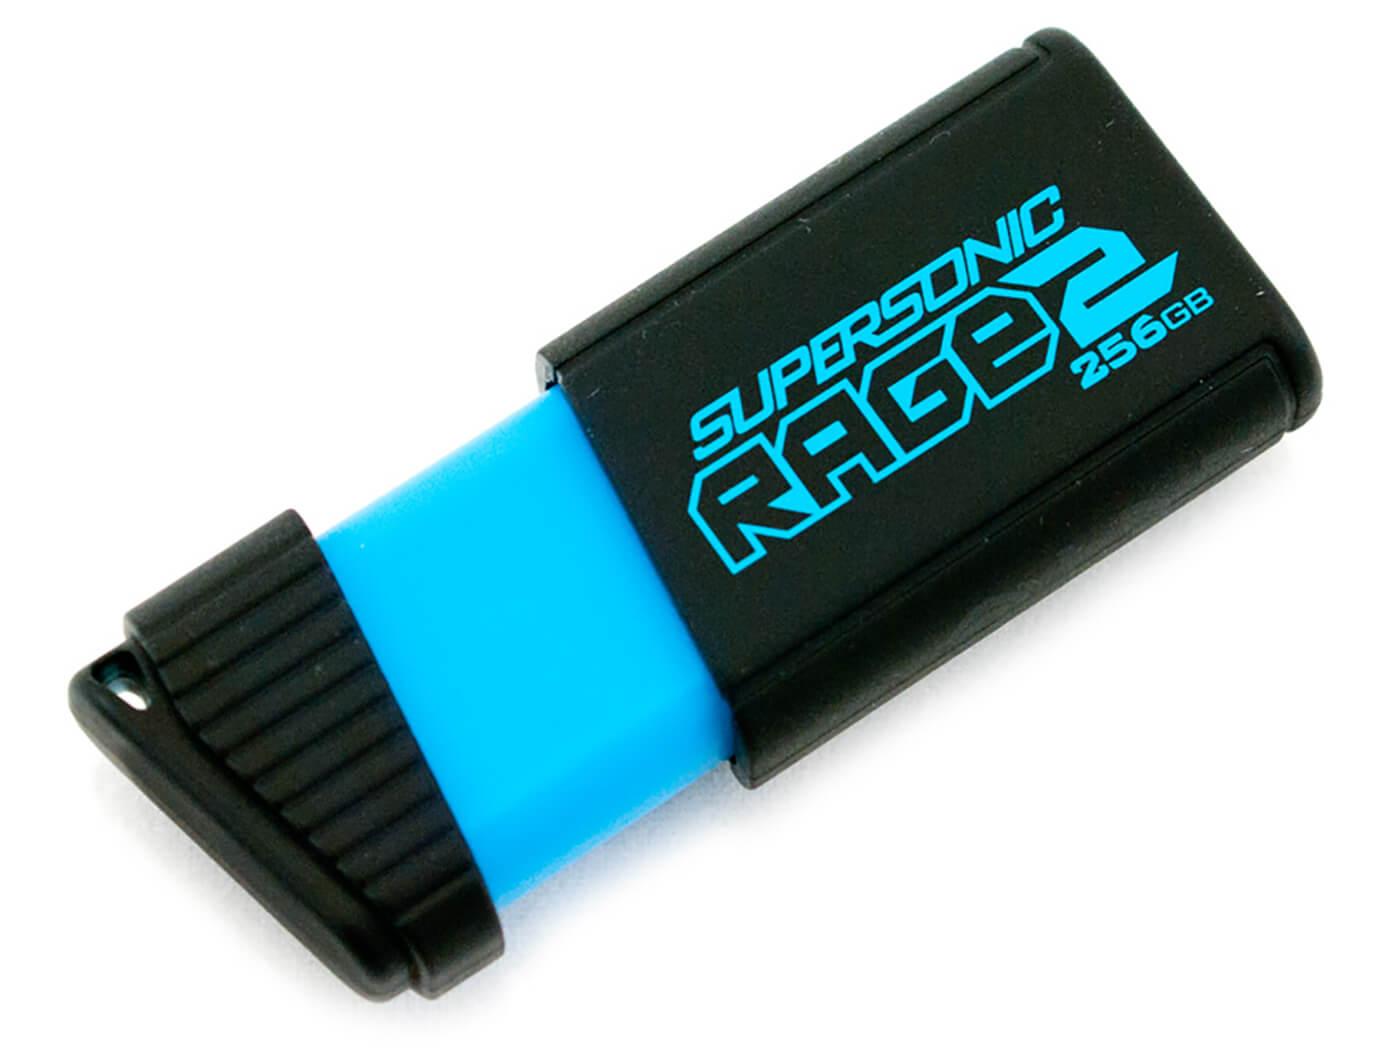 Patriot Supersonic Rage 2 (256BG)